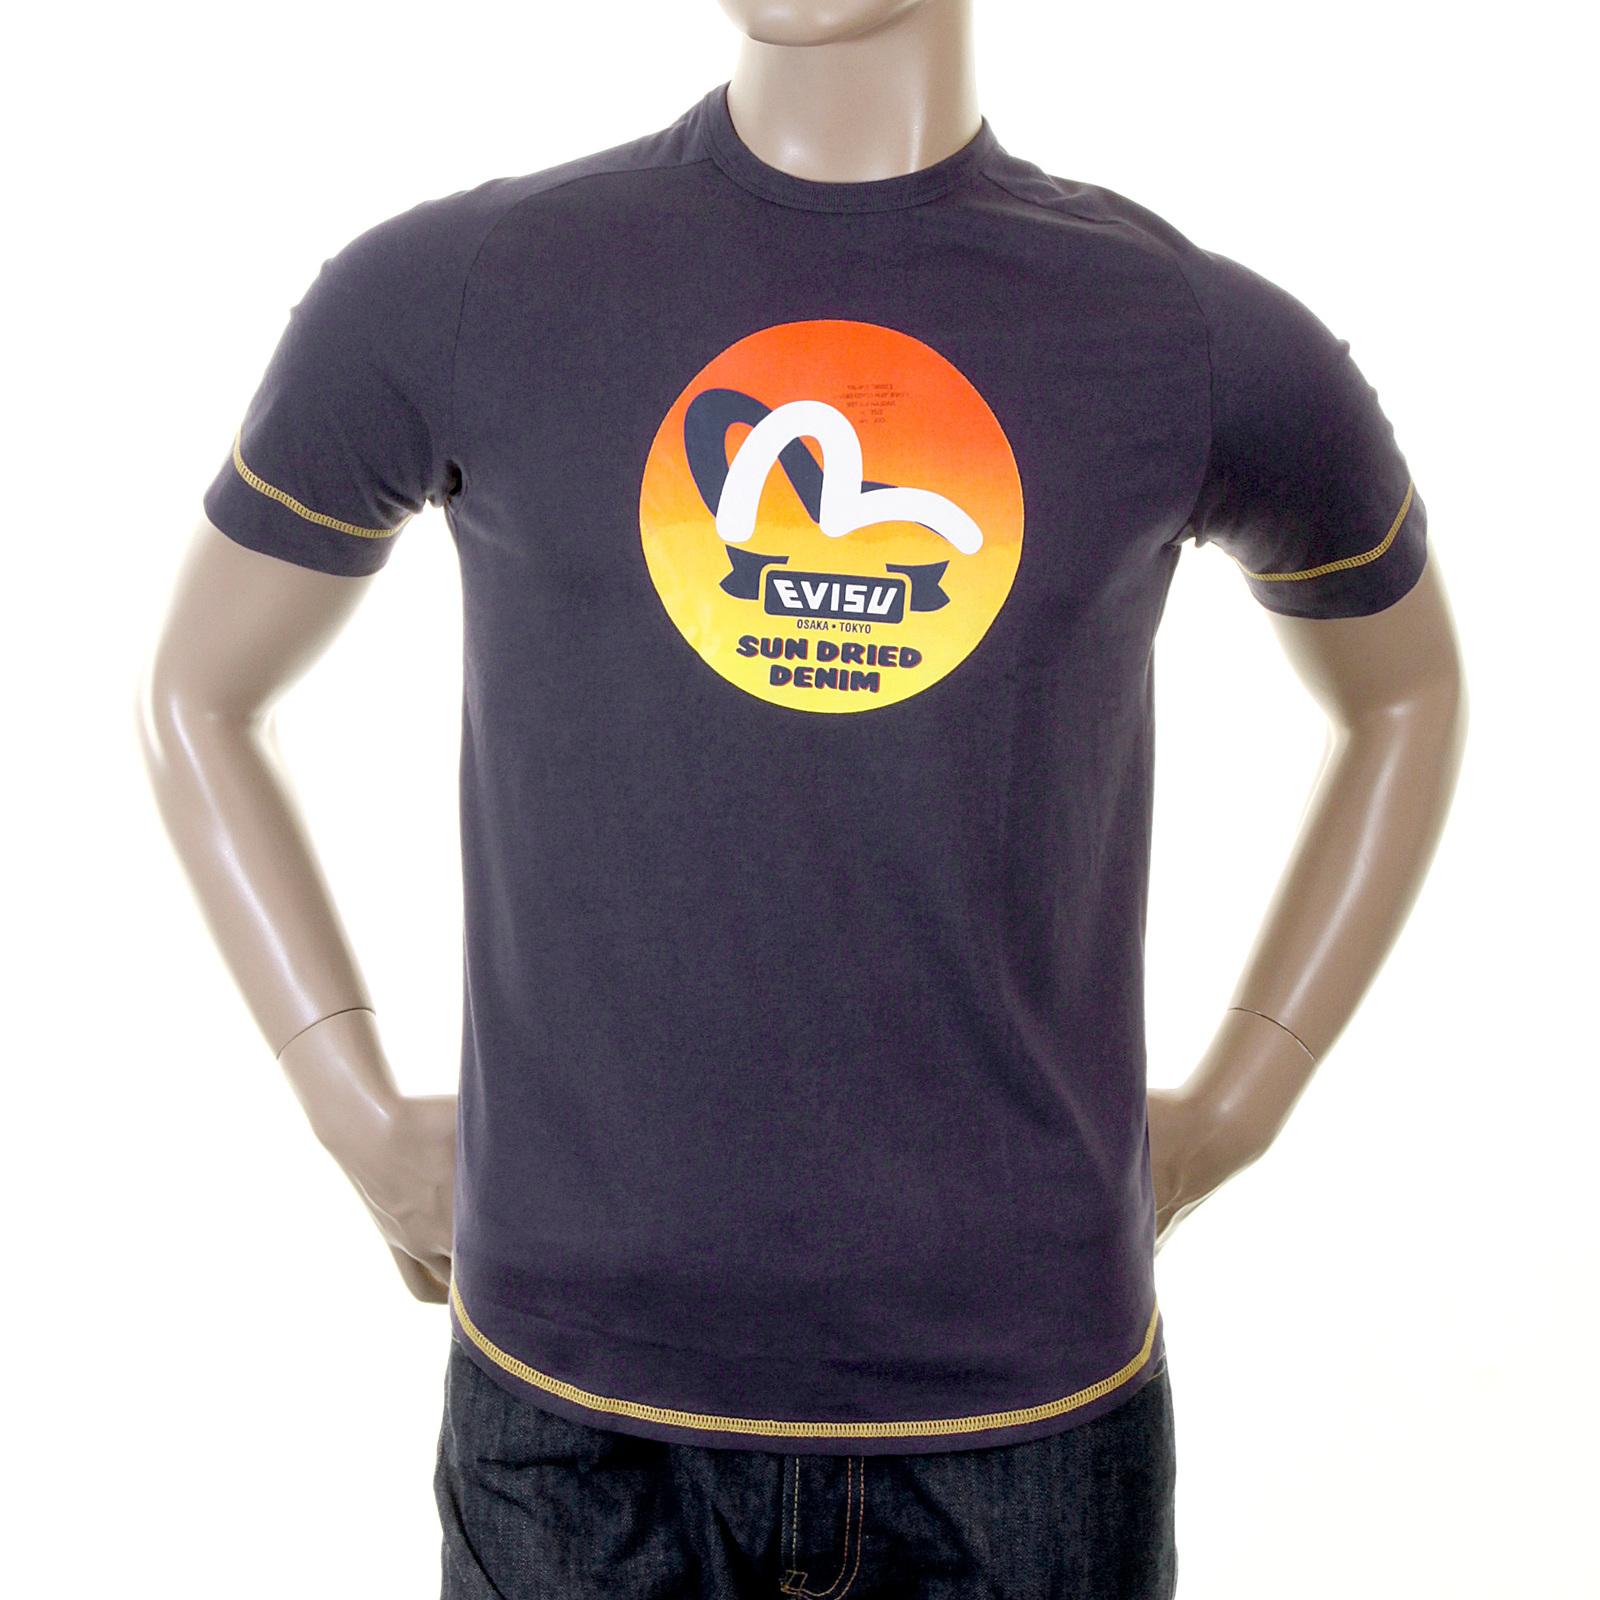 372da2fff177 Genuine and Early Design Logo T-Shirt by Evisu London